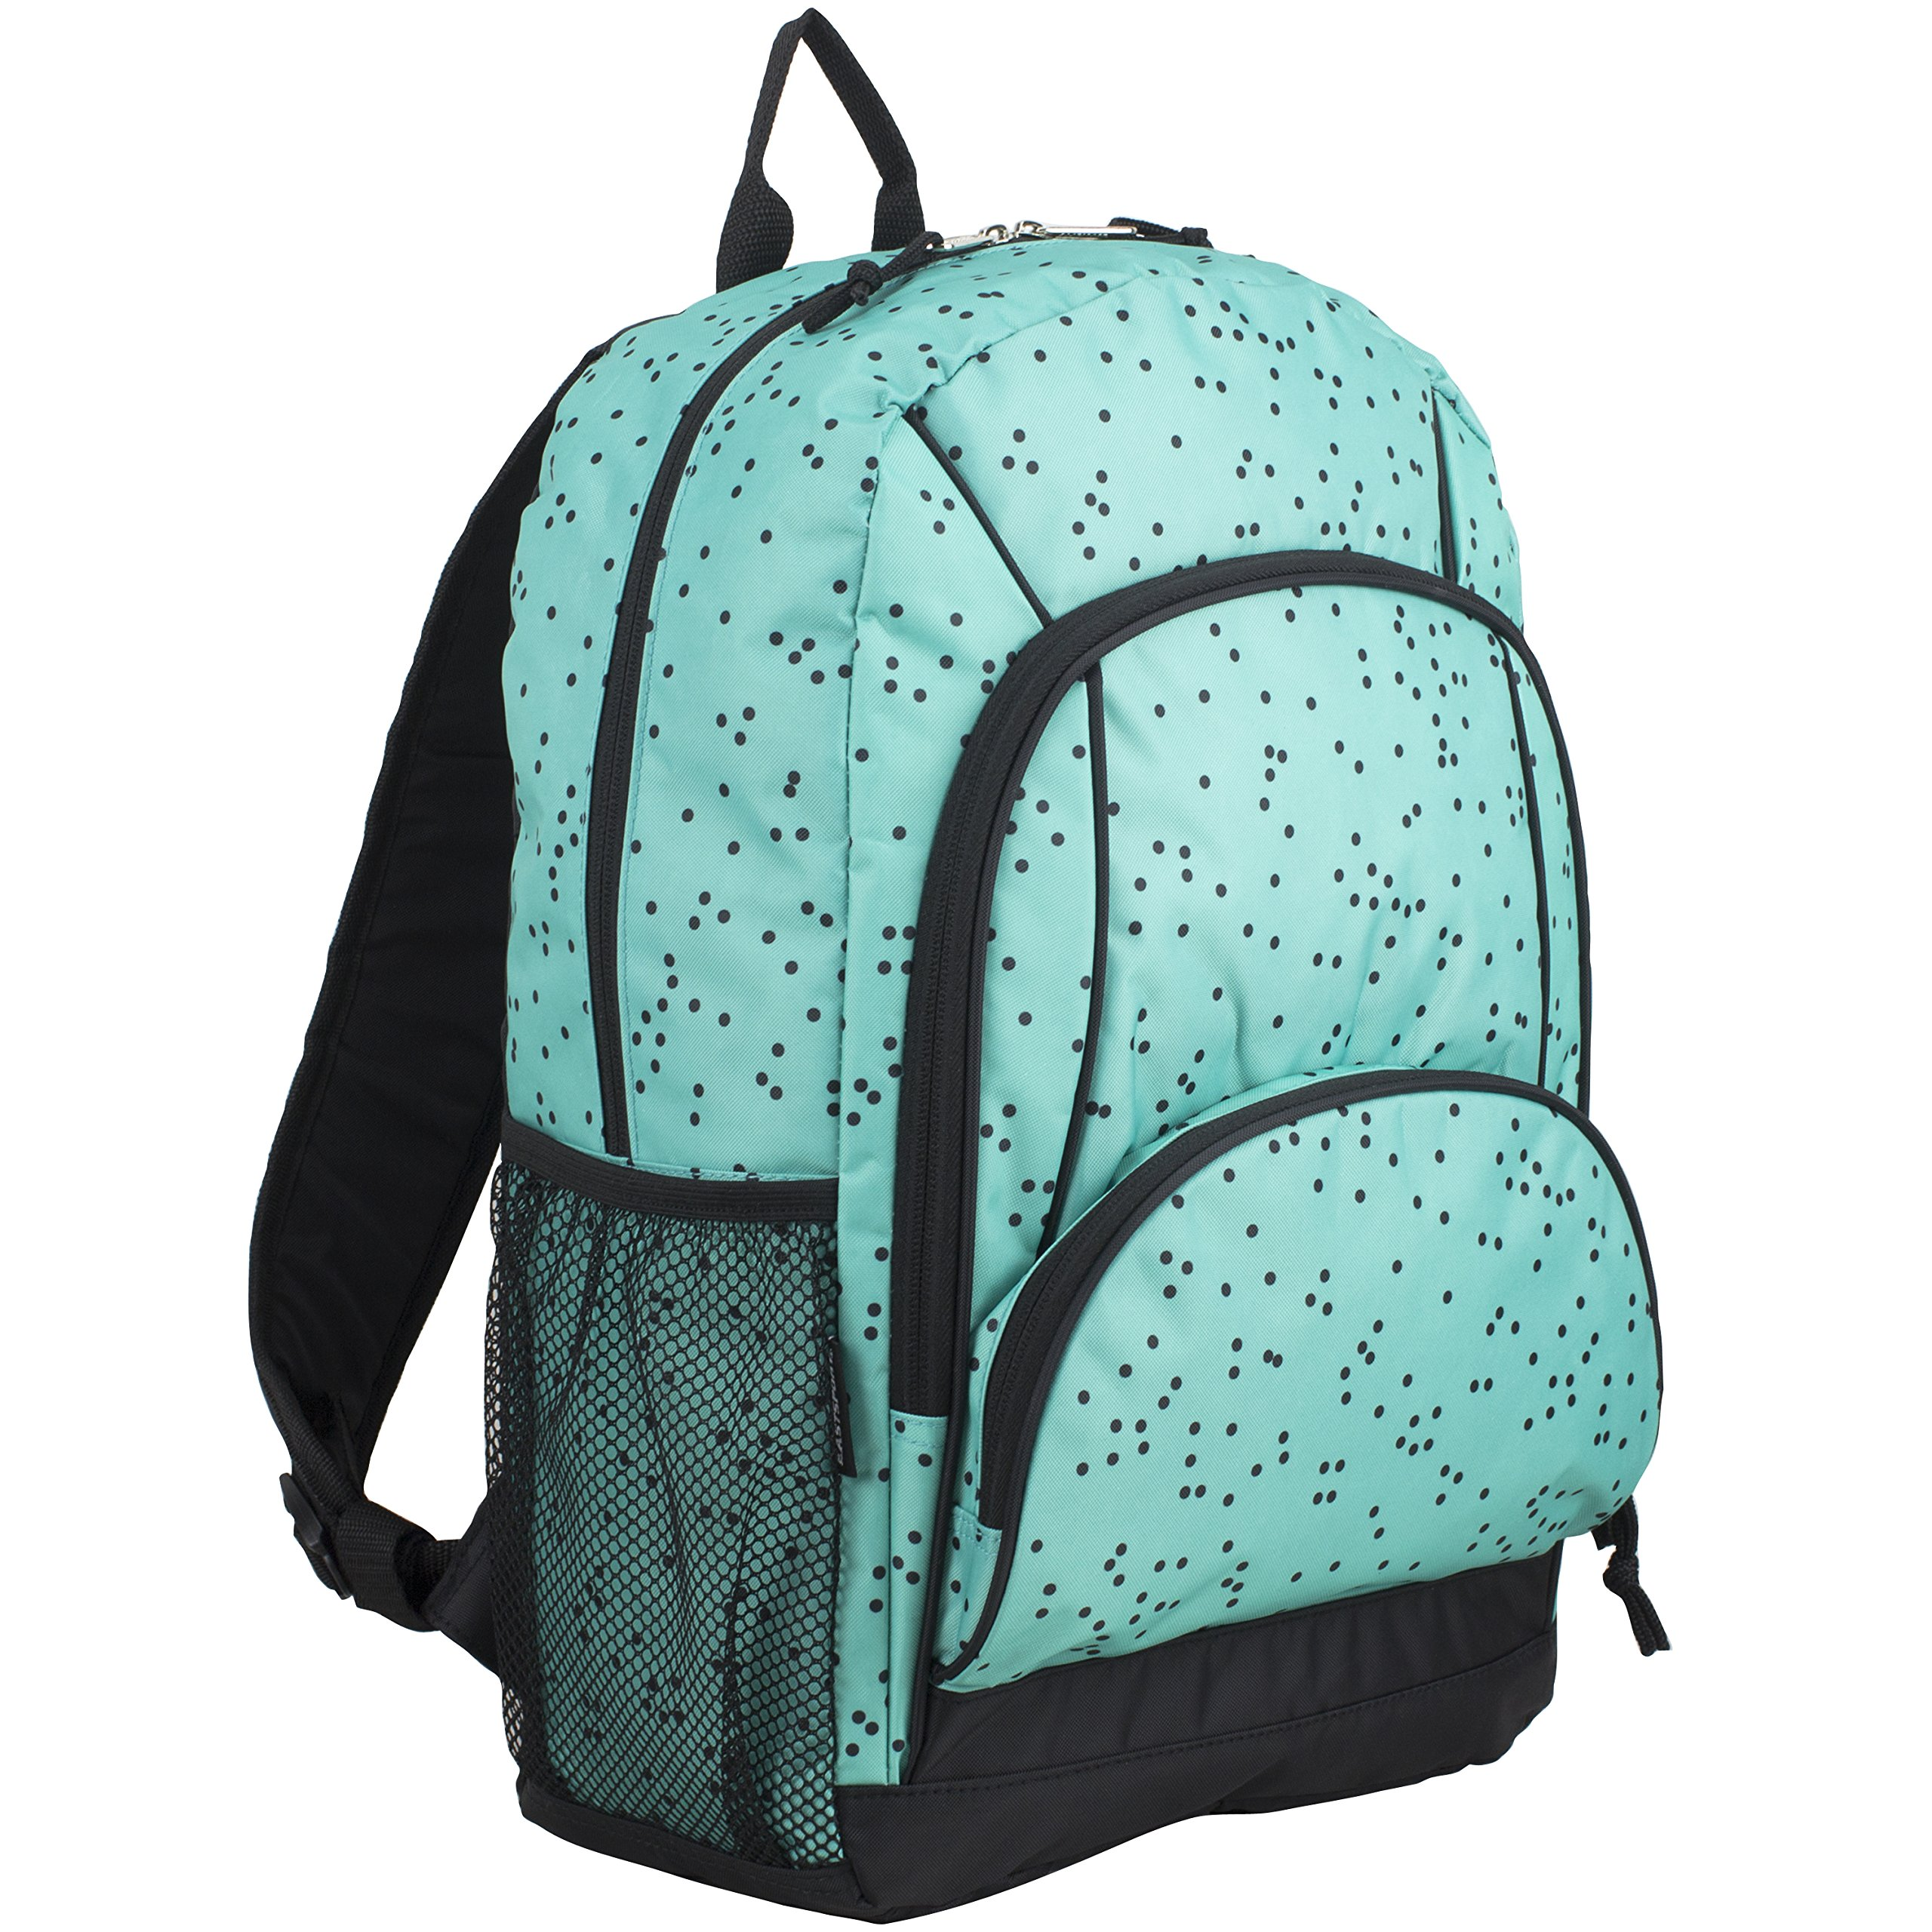 Eastsport Multi Pocket School Backpack, Turquoise/Black Dots Print by Eastsport